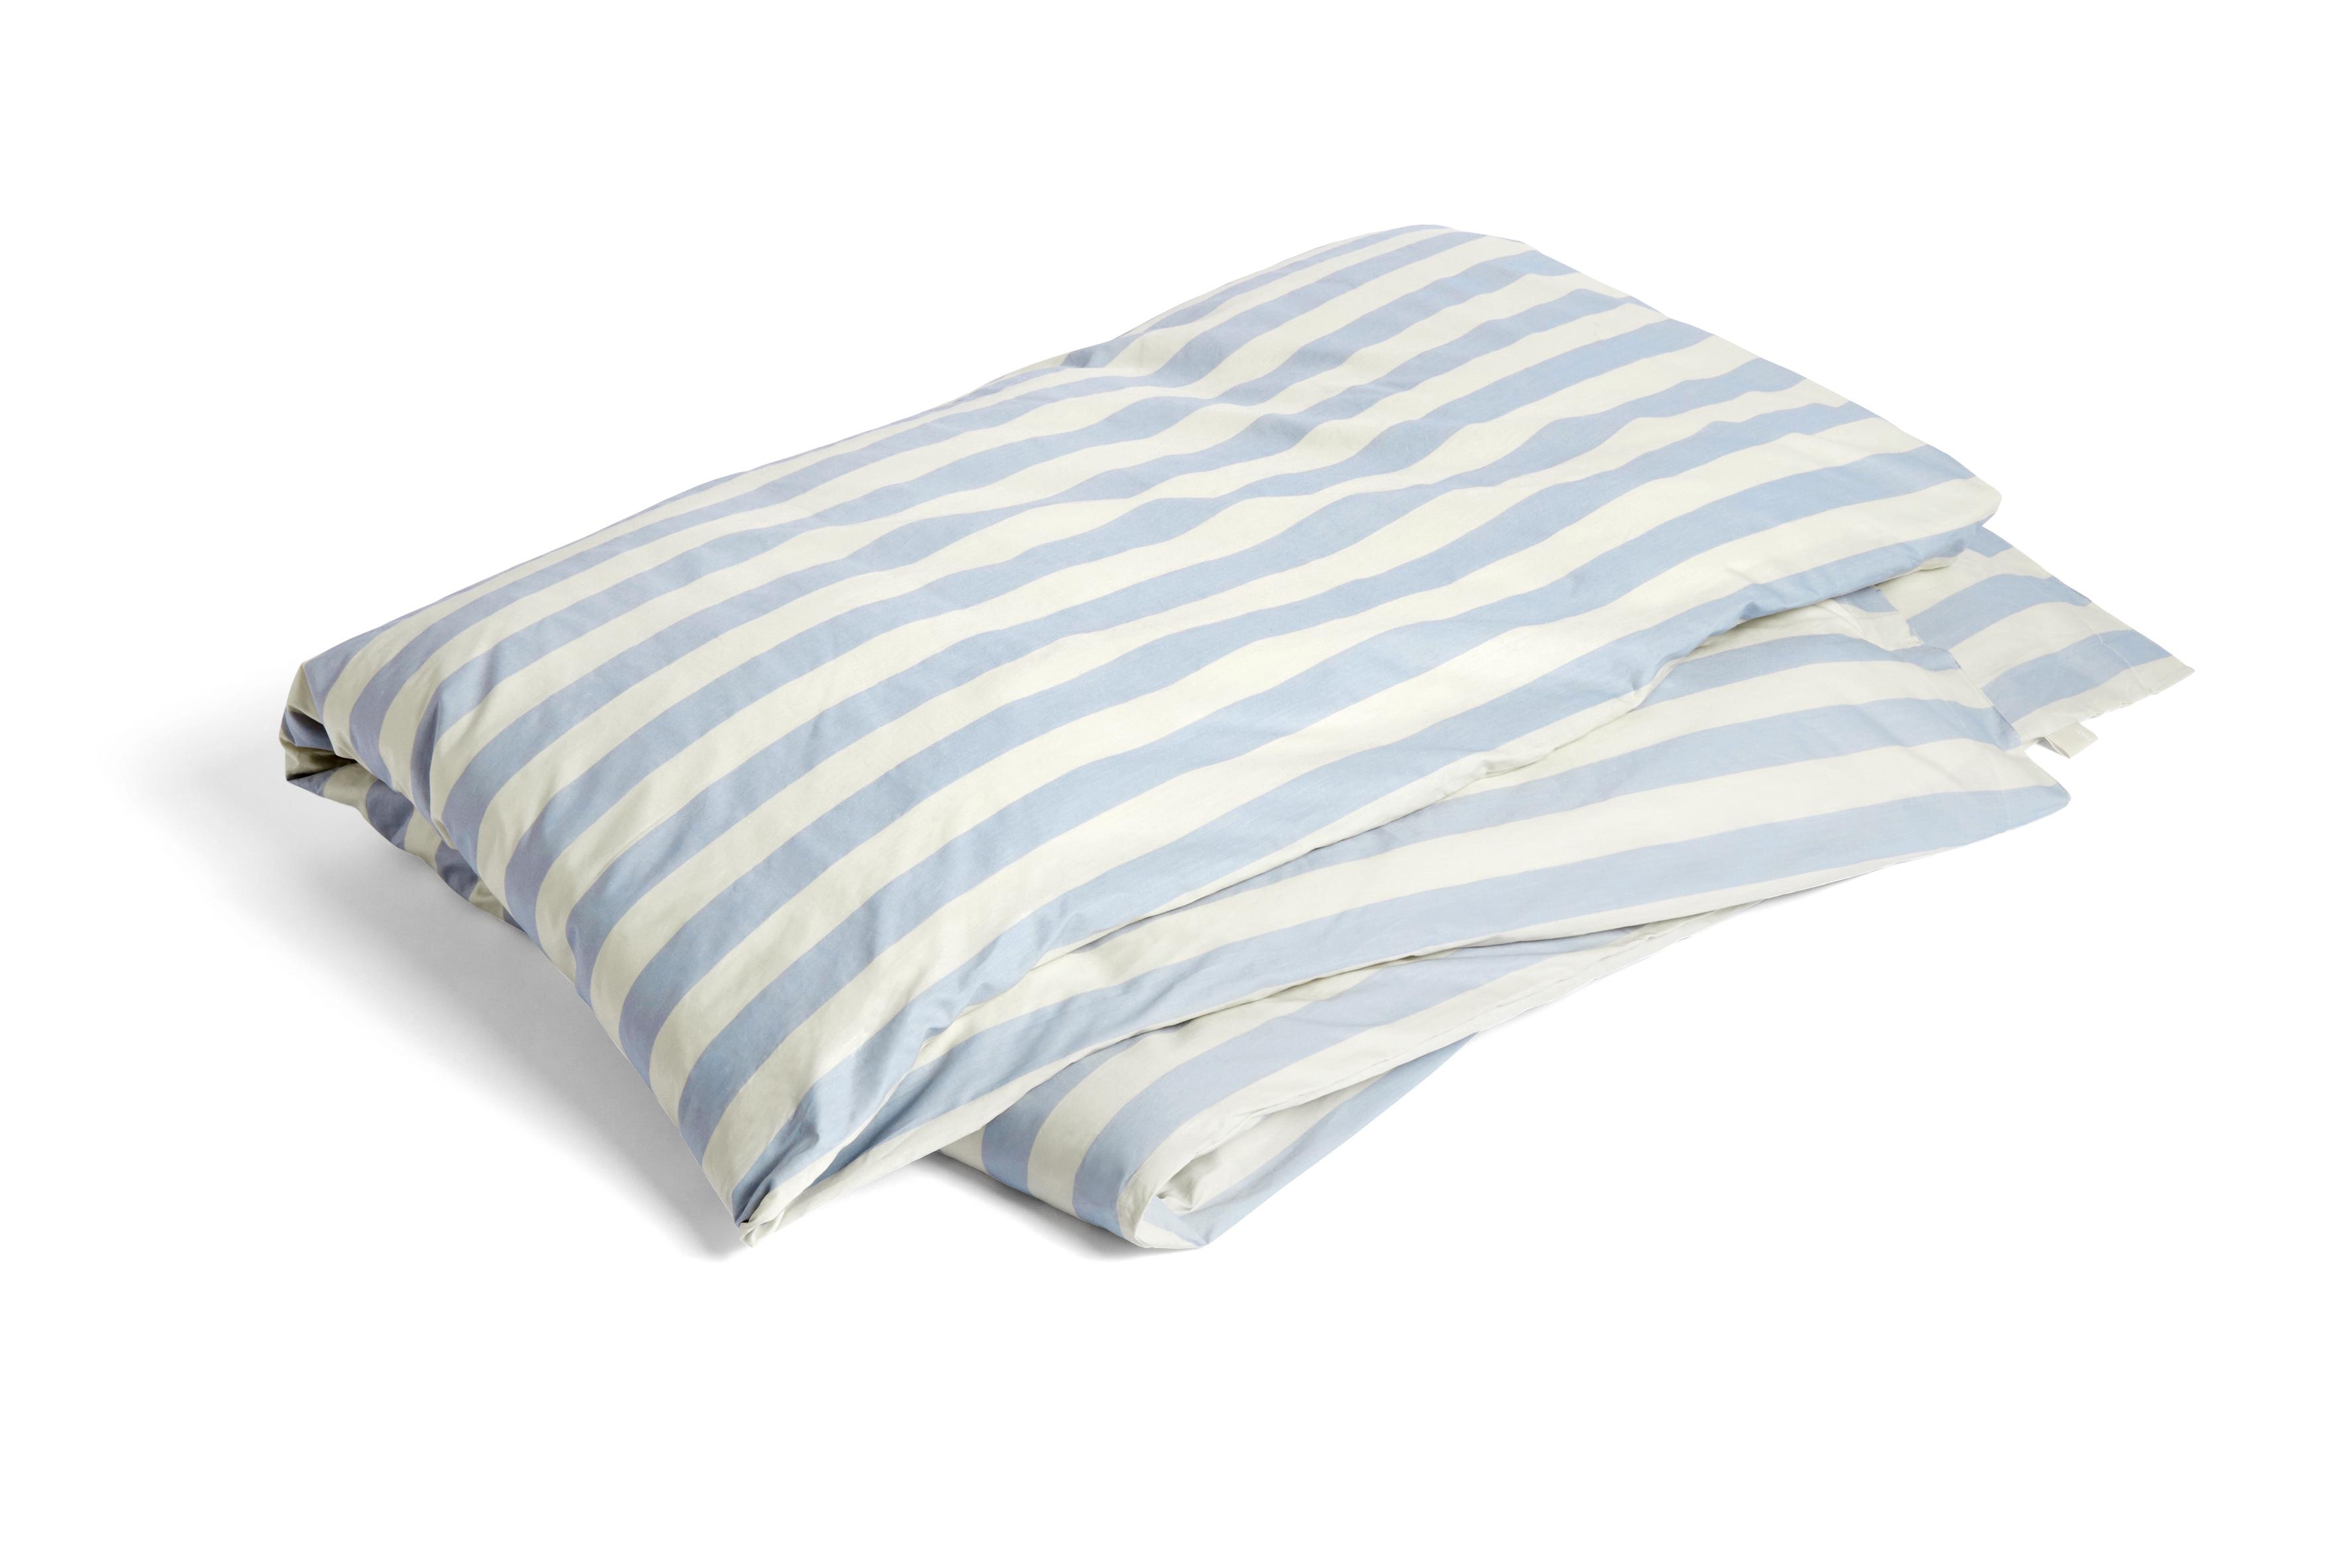 HAY Bettbezug Été light blue